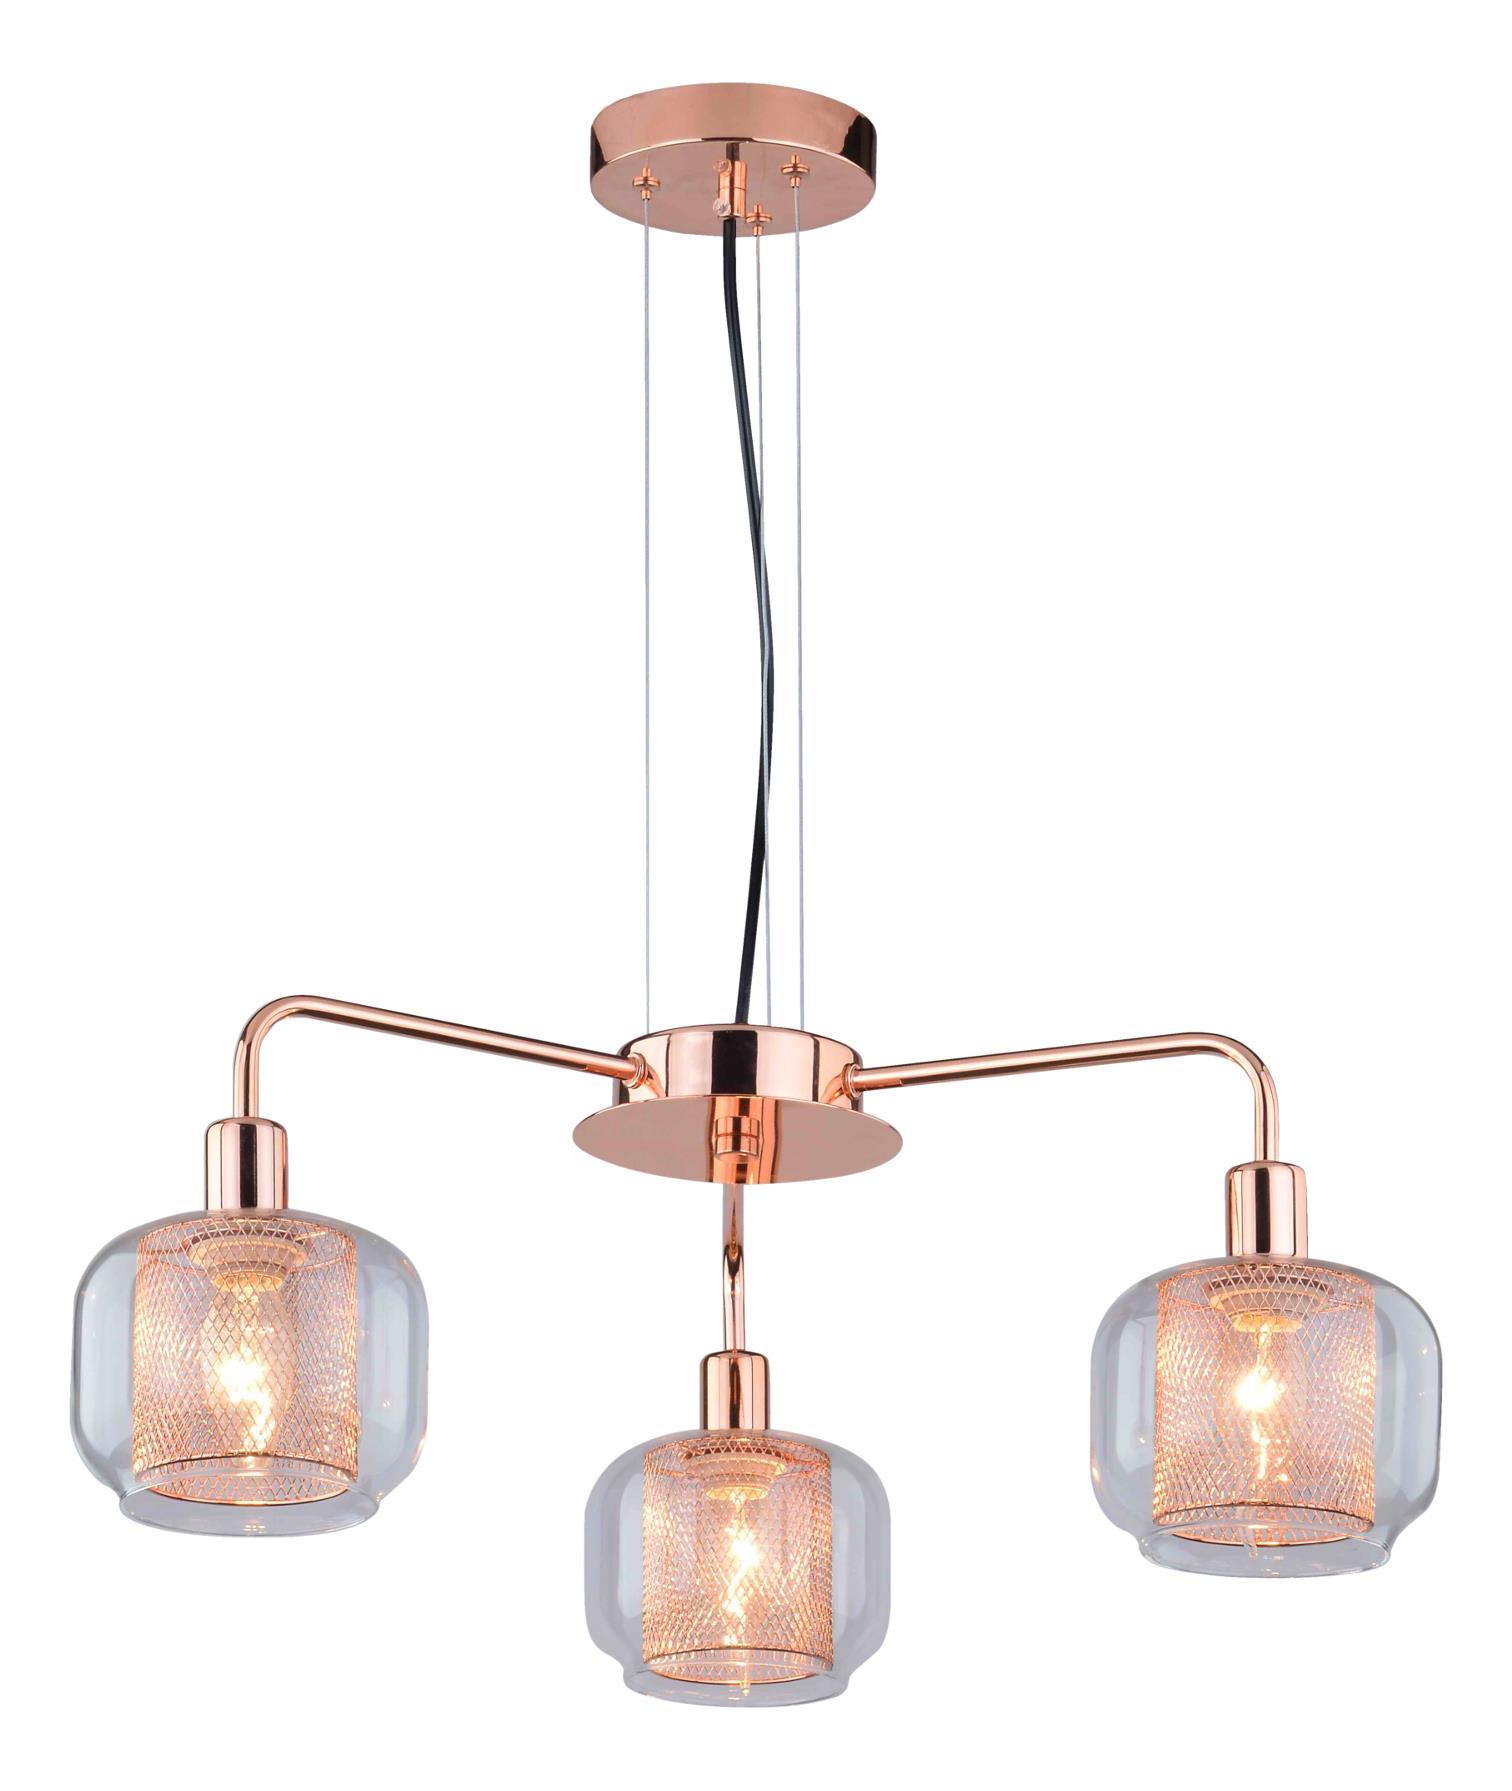 Lampa wisząca Ami 3